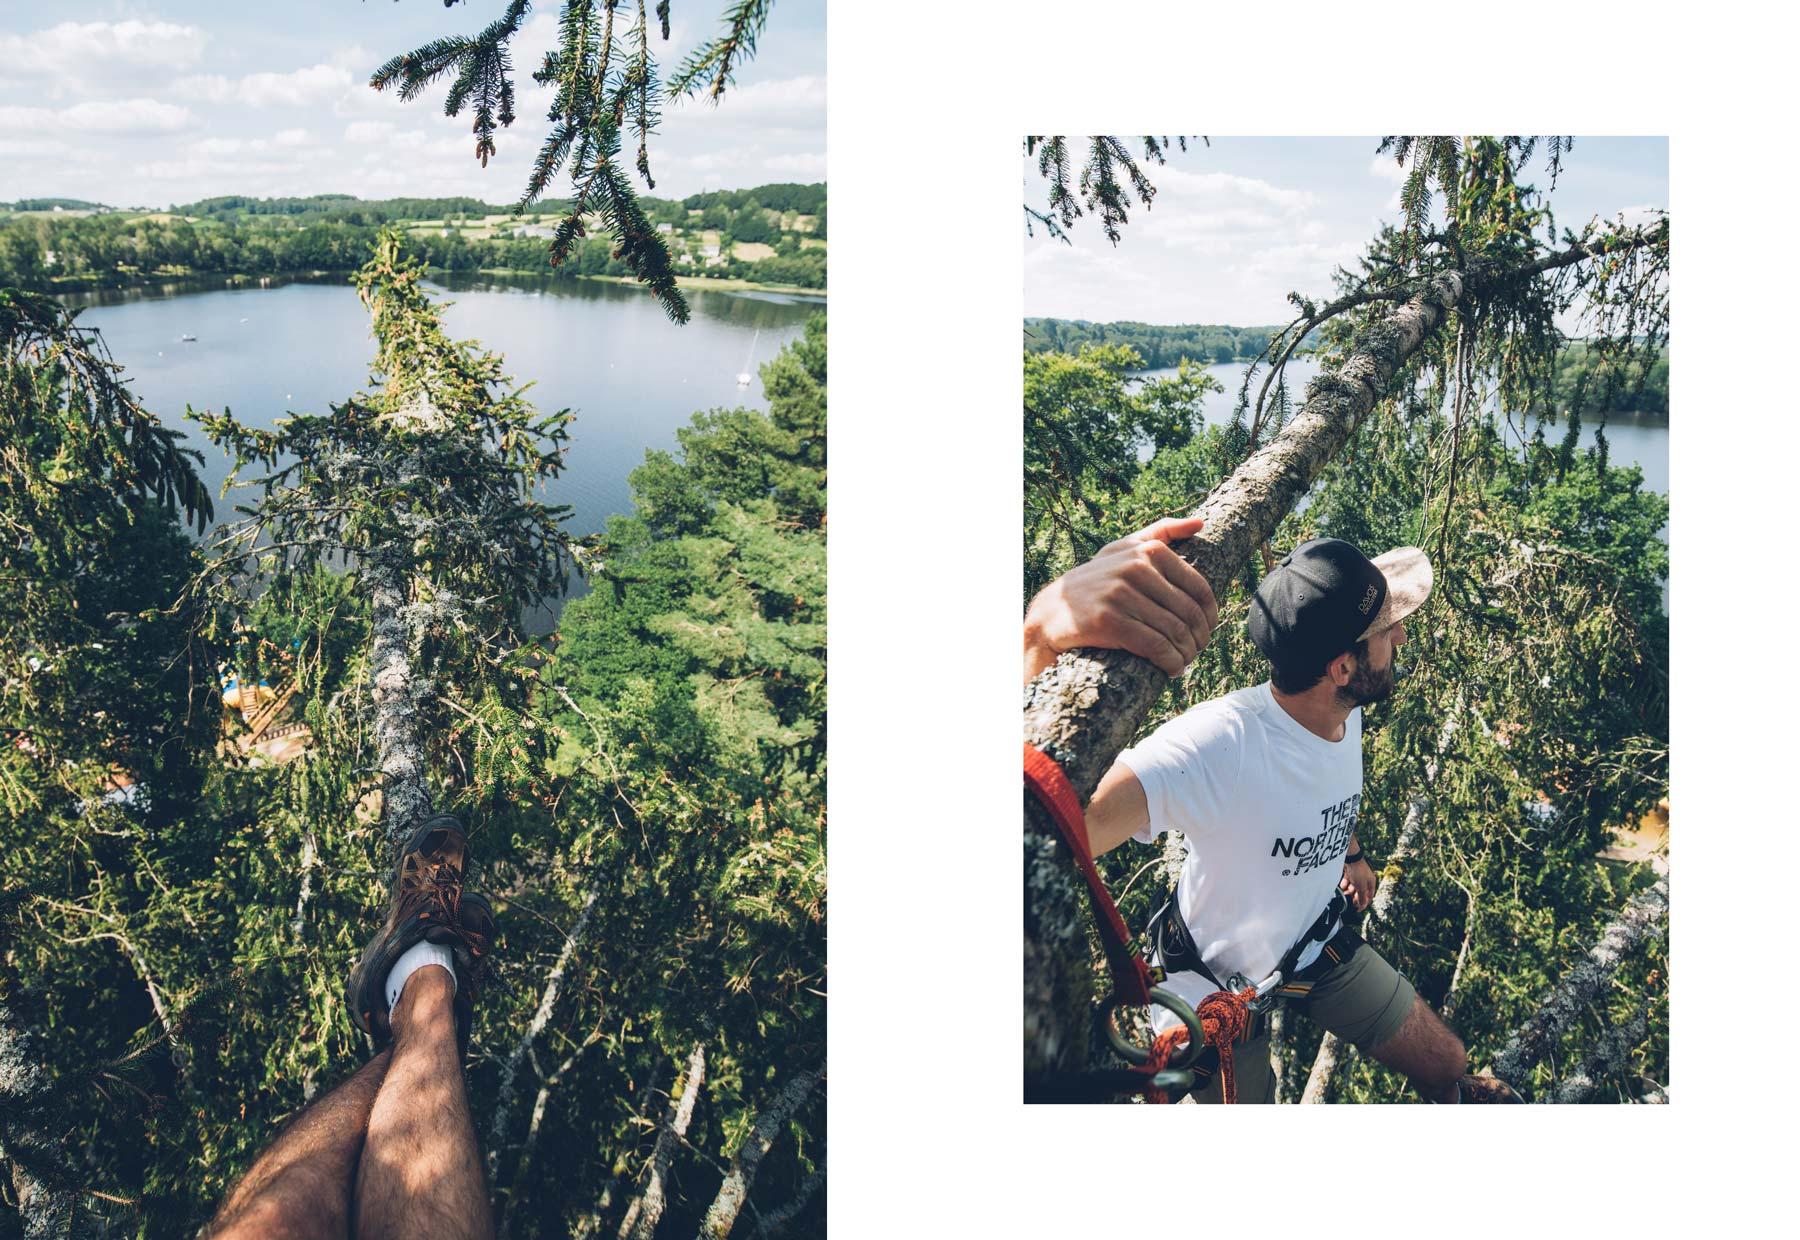 Grimpe d'arbre Arbr'acadabra